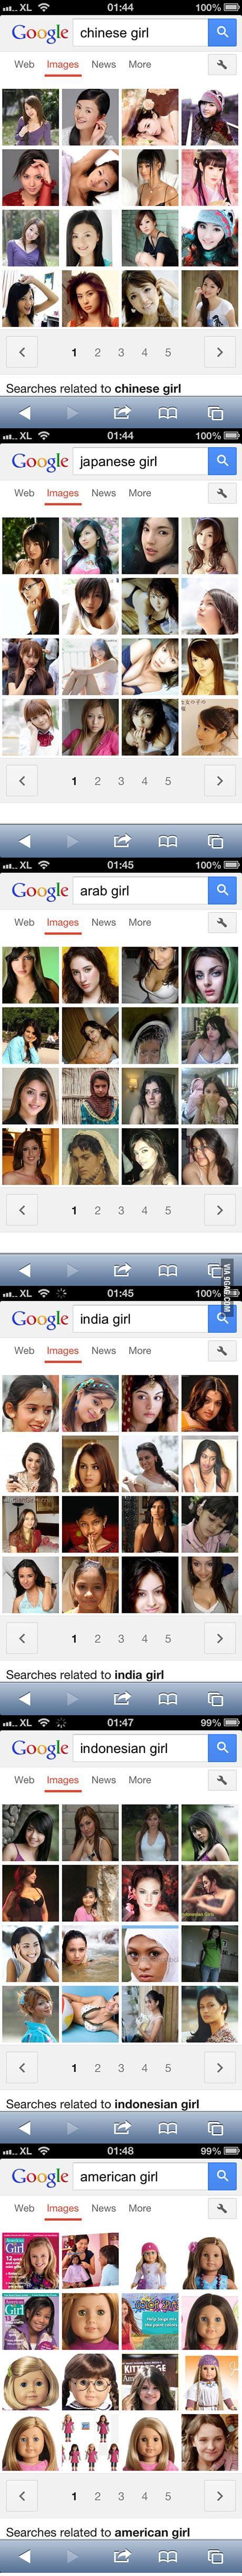 Comparing Girls Worldwide, Thanks Google!